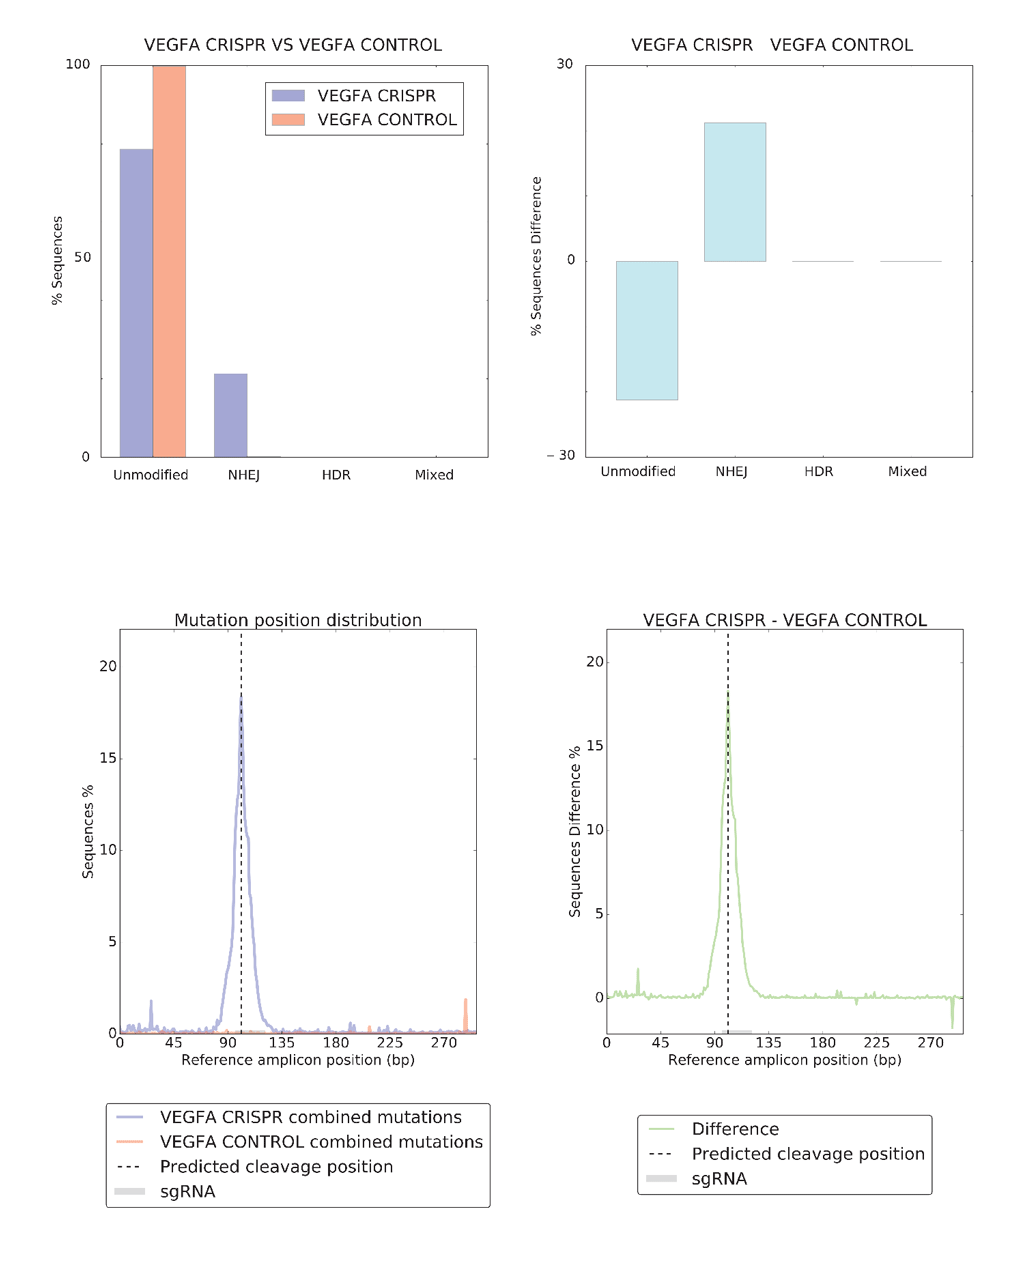 https://github.com/lucapinello/CRISPResso/blob/master/CRISPRessoCompare_output.png?raw=true